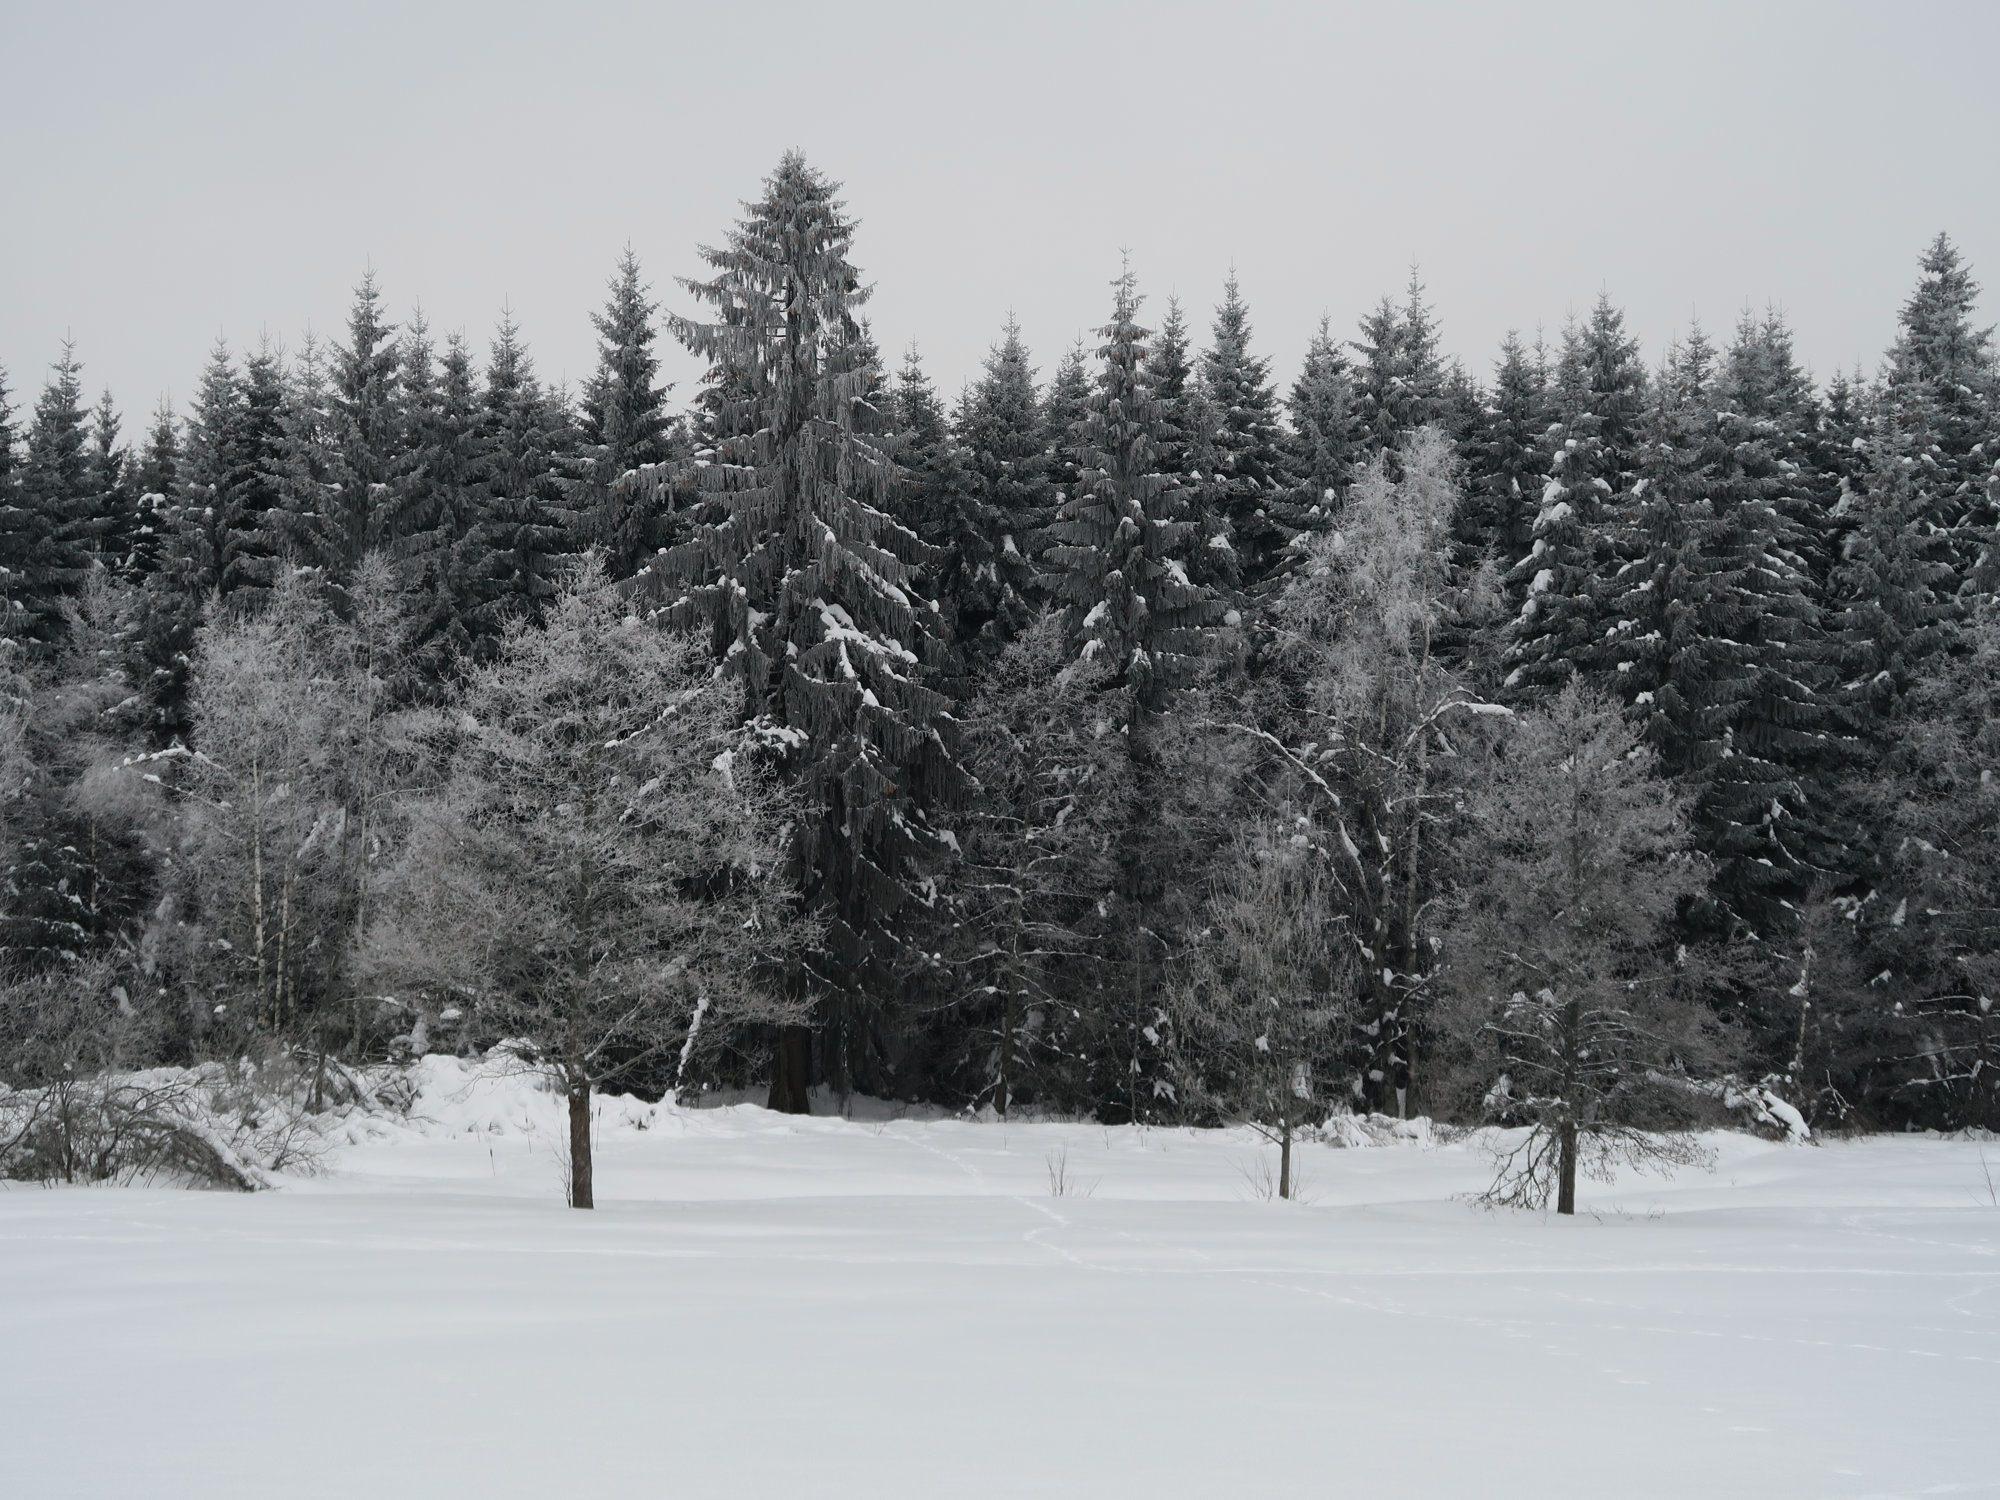 Kammloipe, Langlaufen im Vogtland, Ergebirge